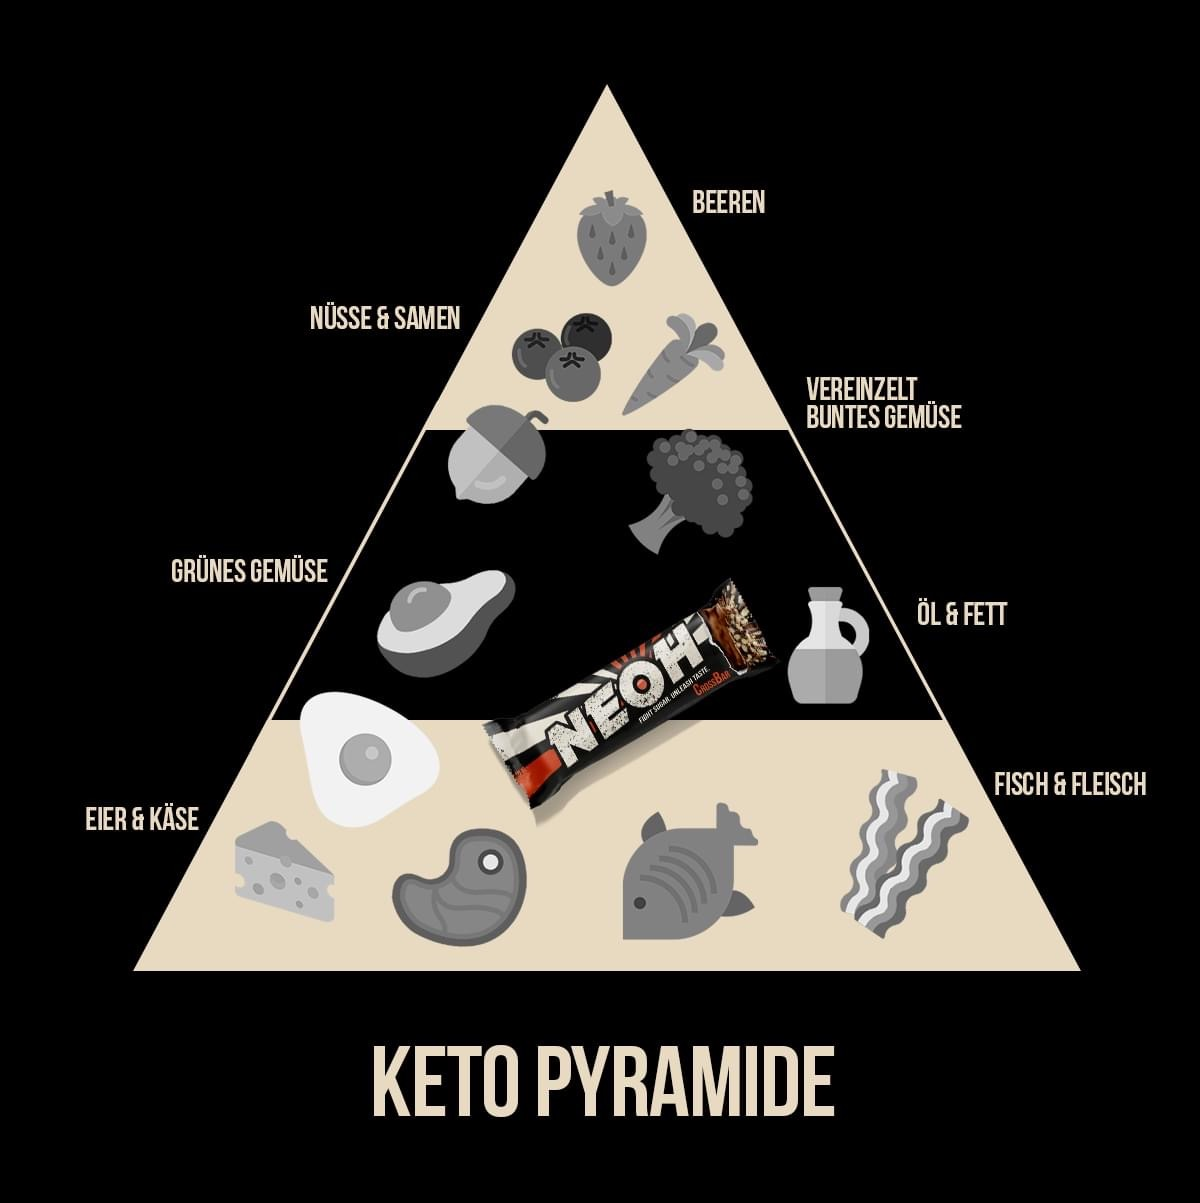 Keto Pyramide